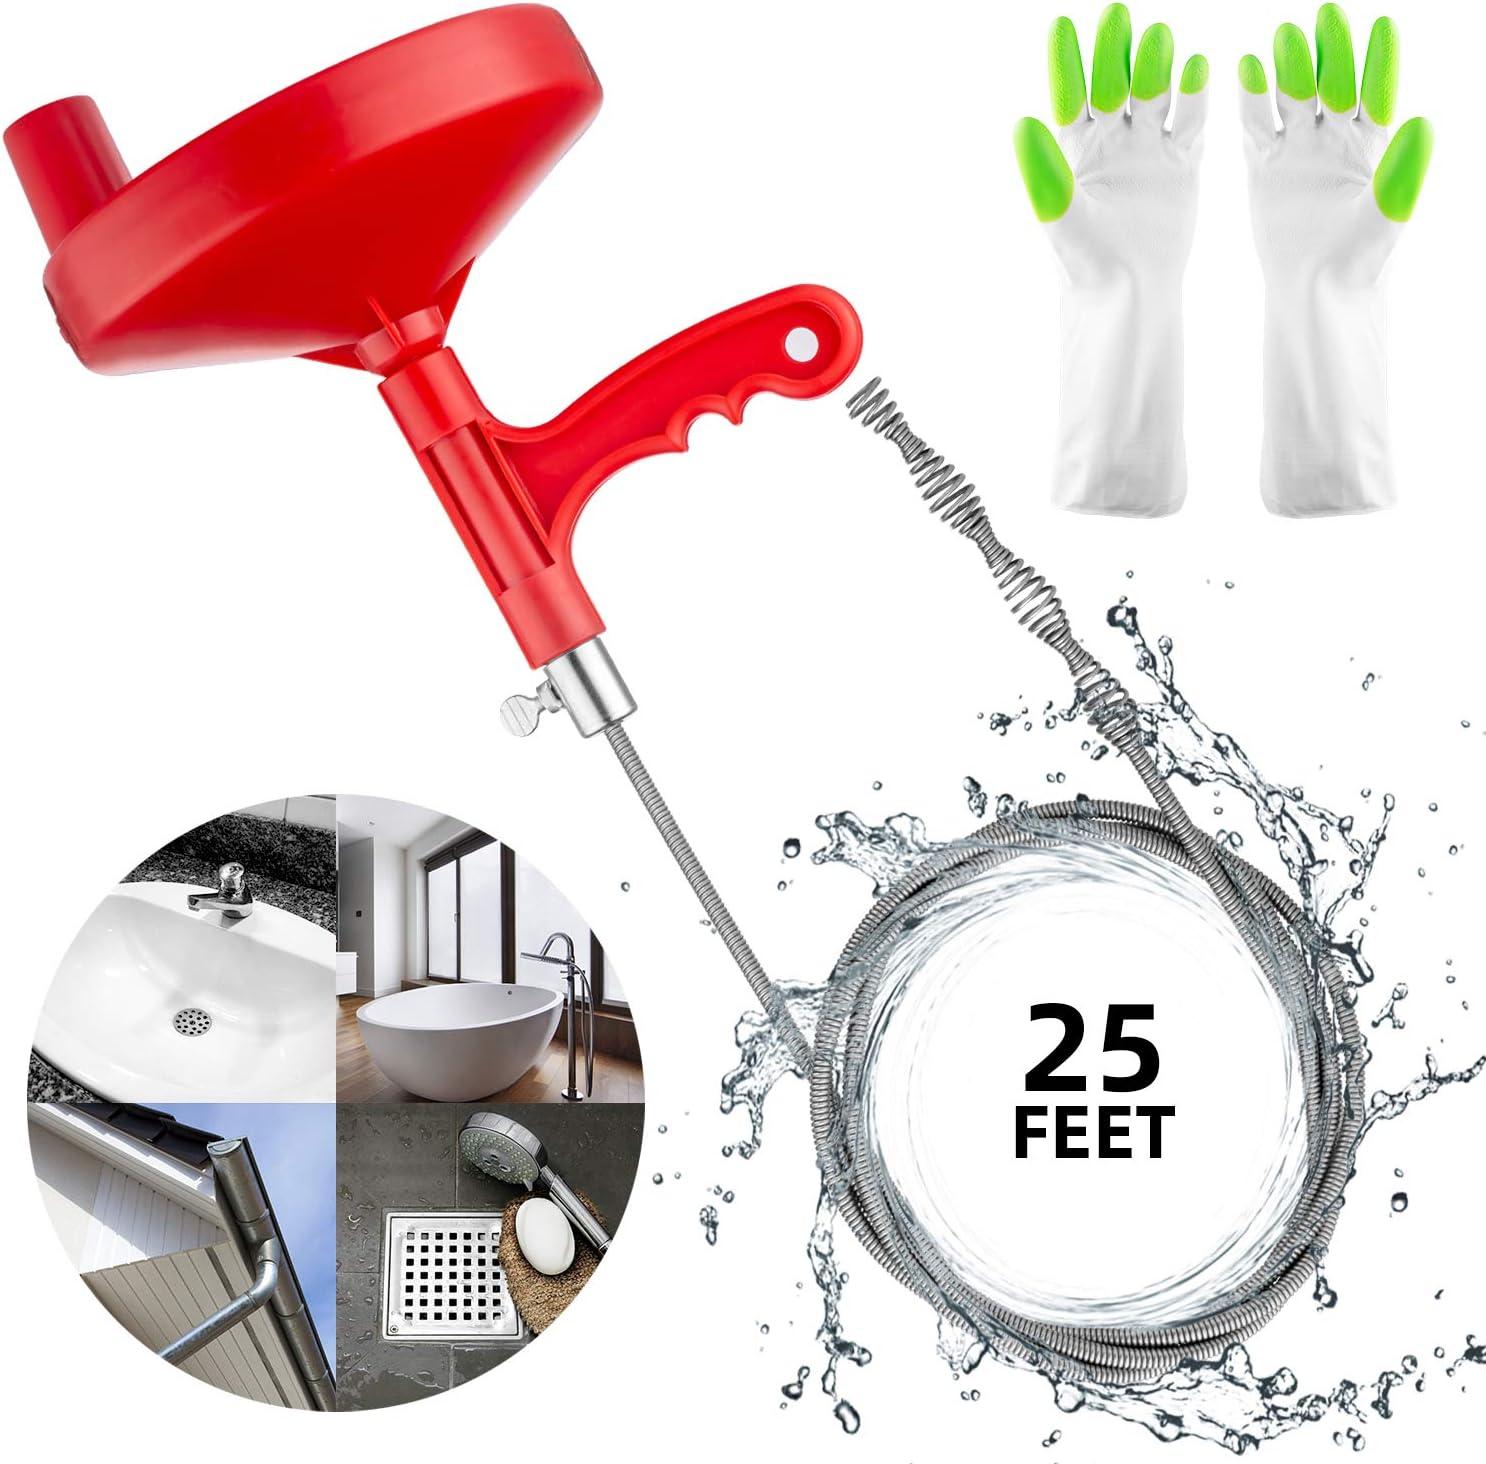 Buy Oriflame 25 Feet Plumbing Snake Drain Auger Sink Snake Pipe Drain Cleaner For Bathroom Kitchen Sink Shower Drain Come With Gloves Online In Vietnam B07yc7szgk